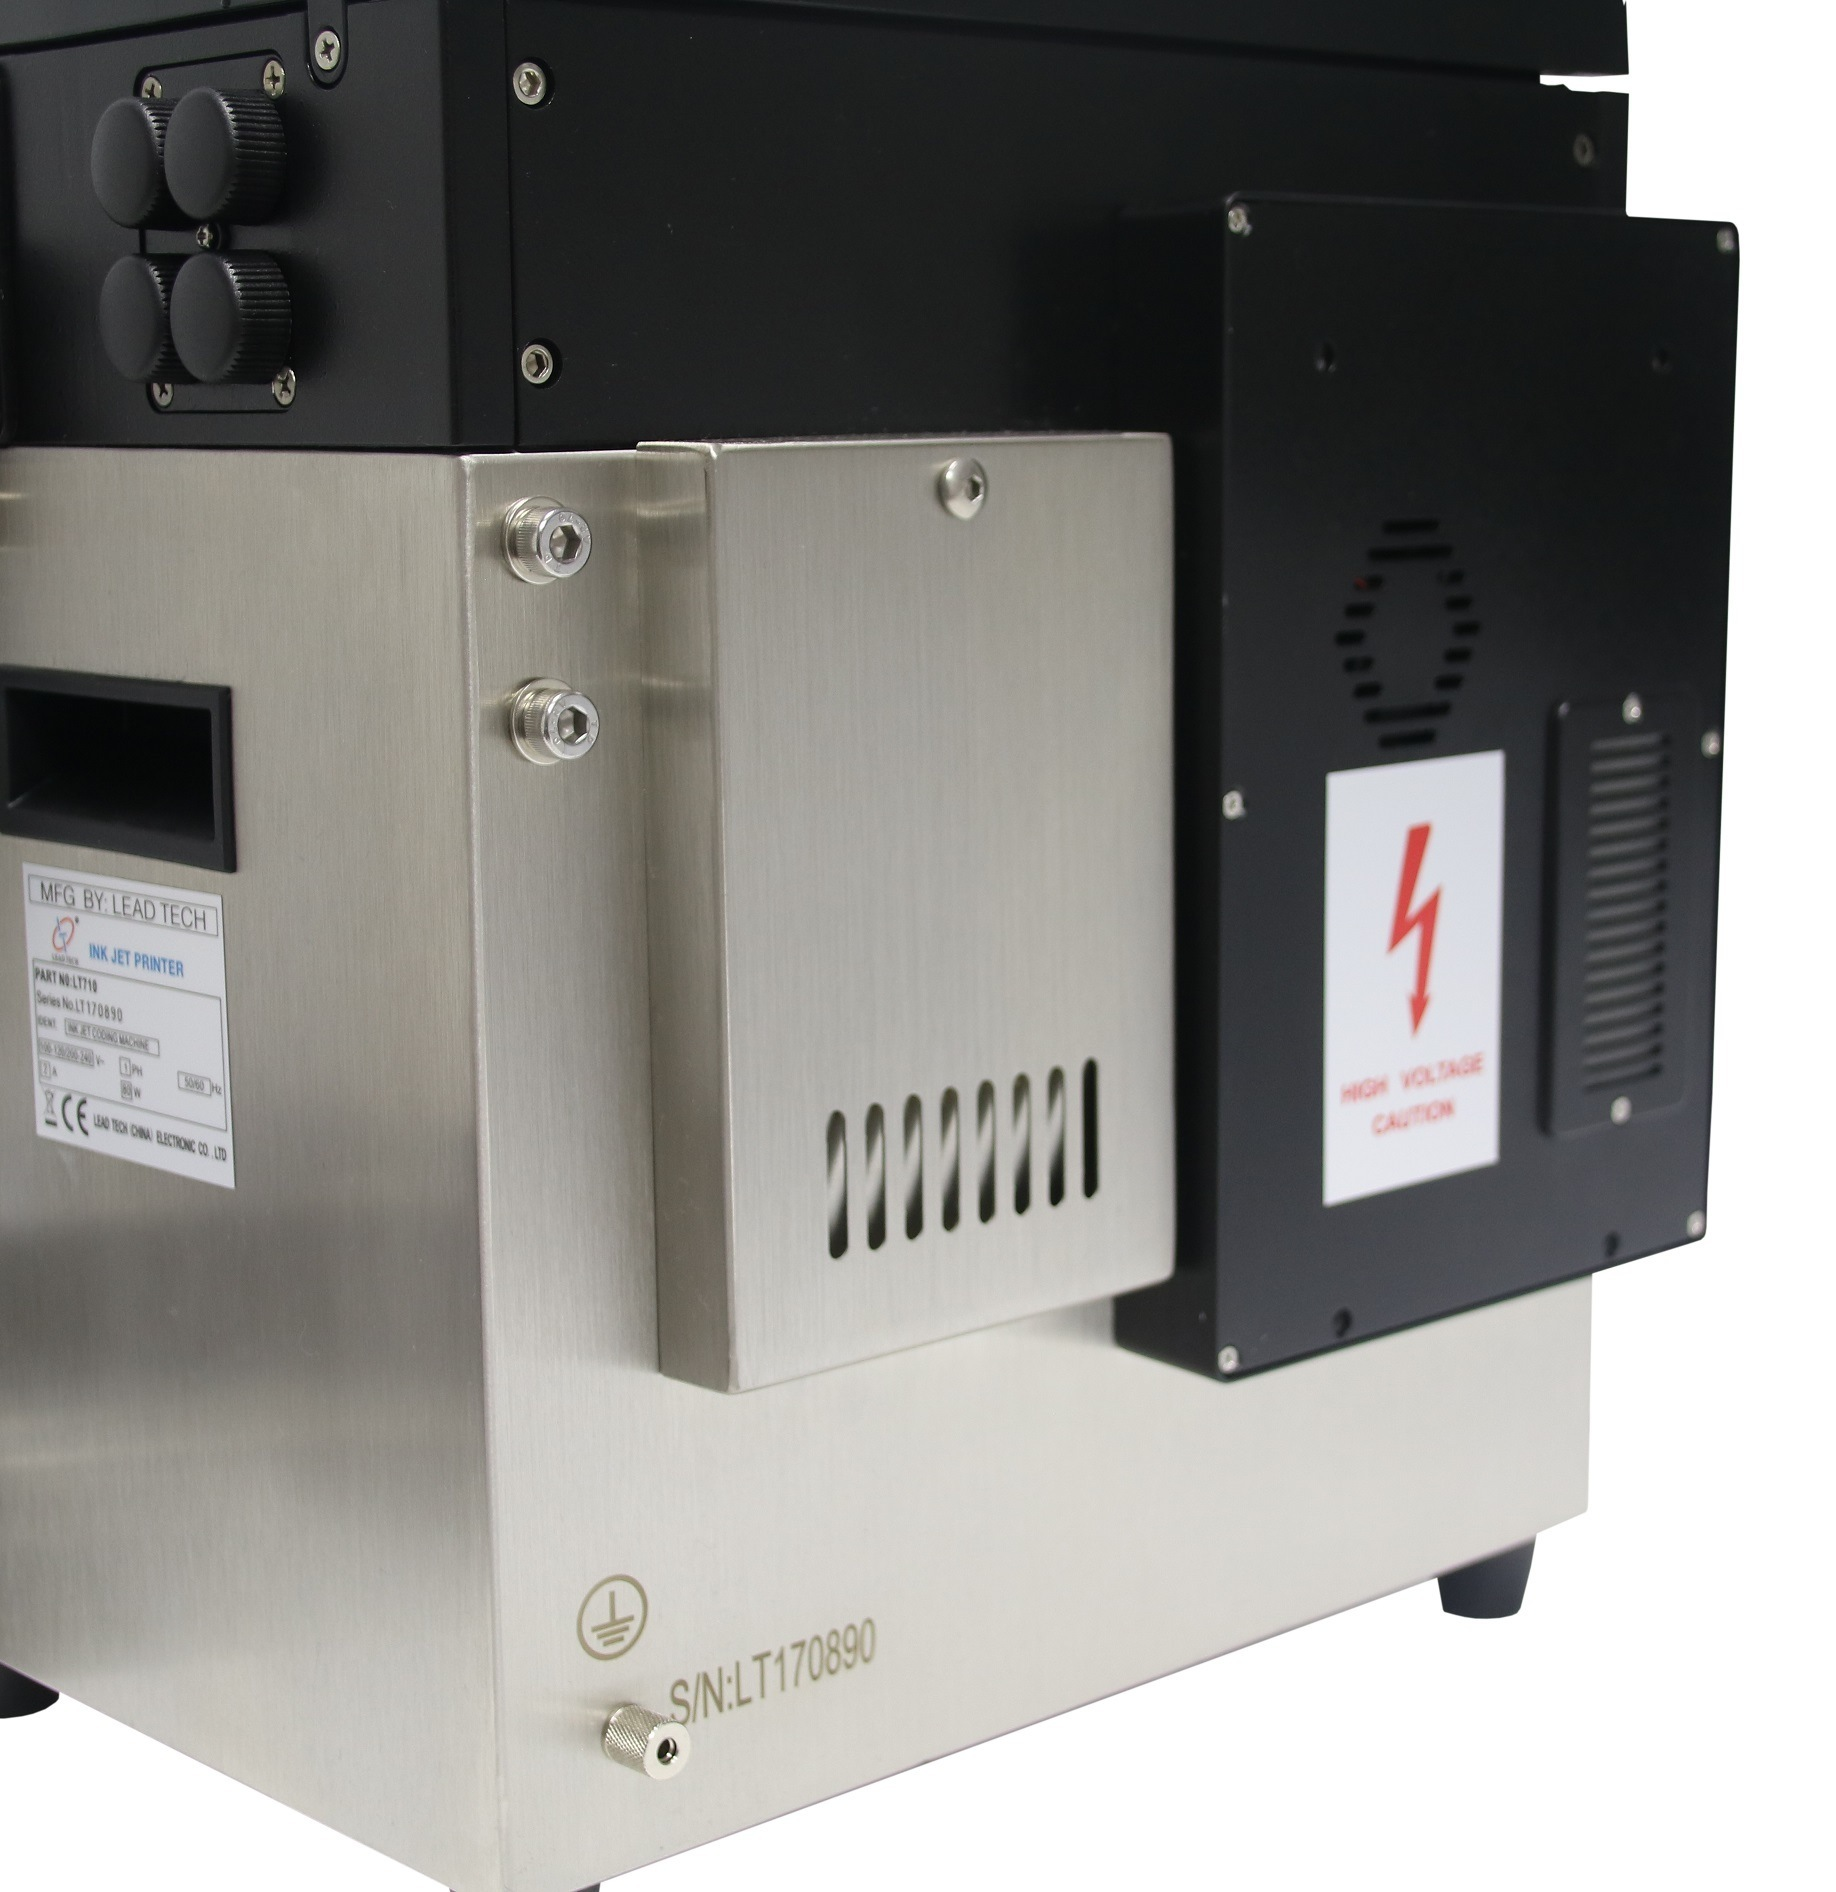 Lead Tech Lt760 Small Characters Tuna Can Printing Inkjet Printer